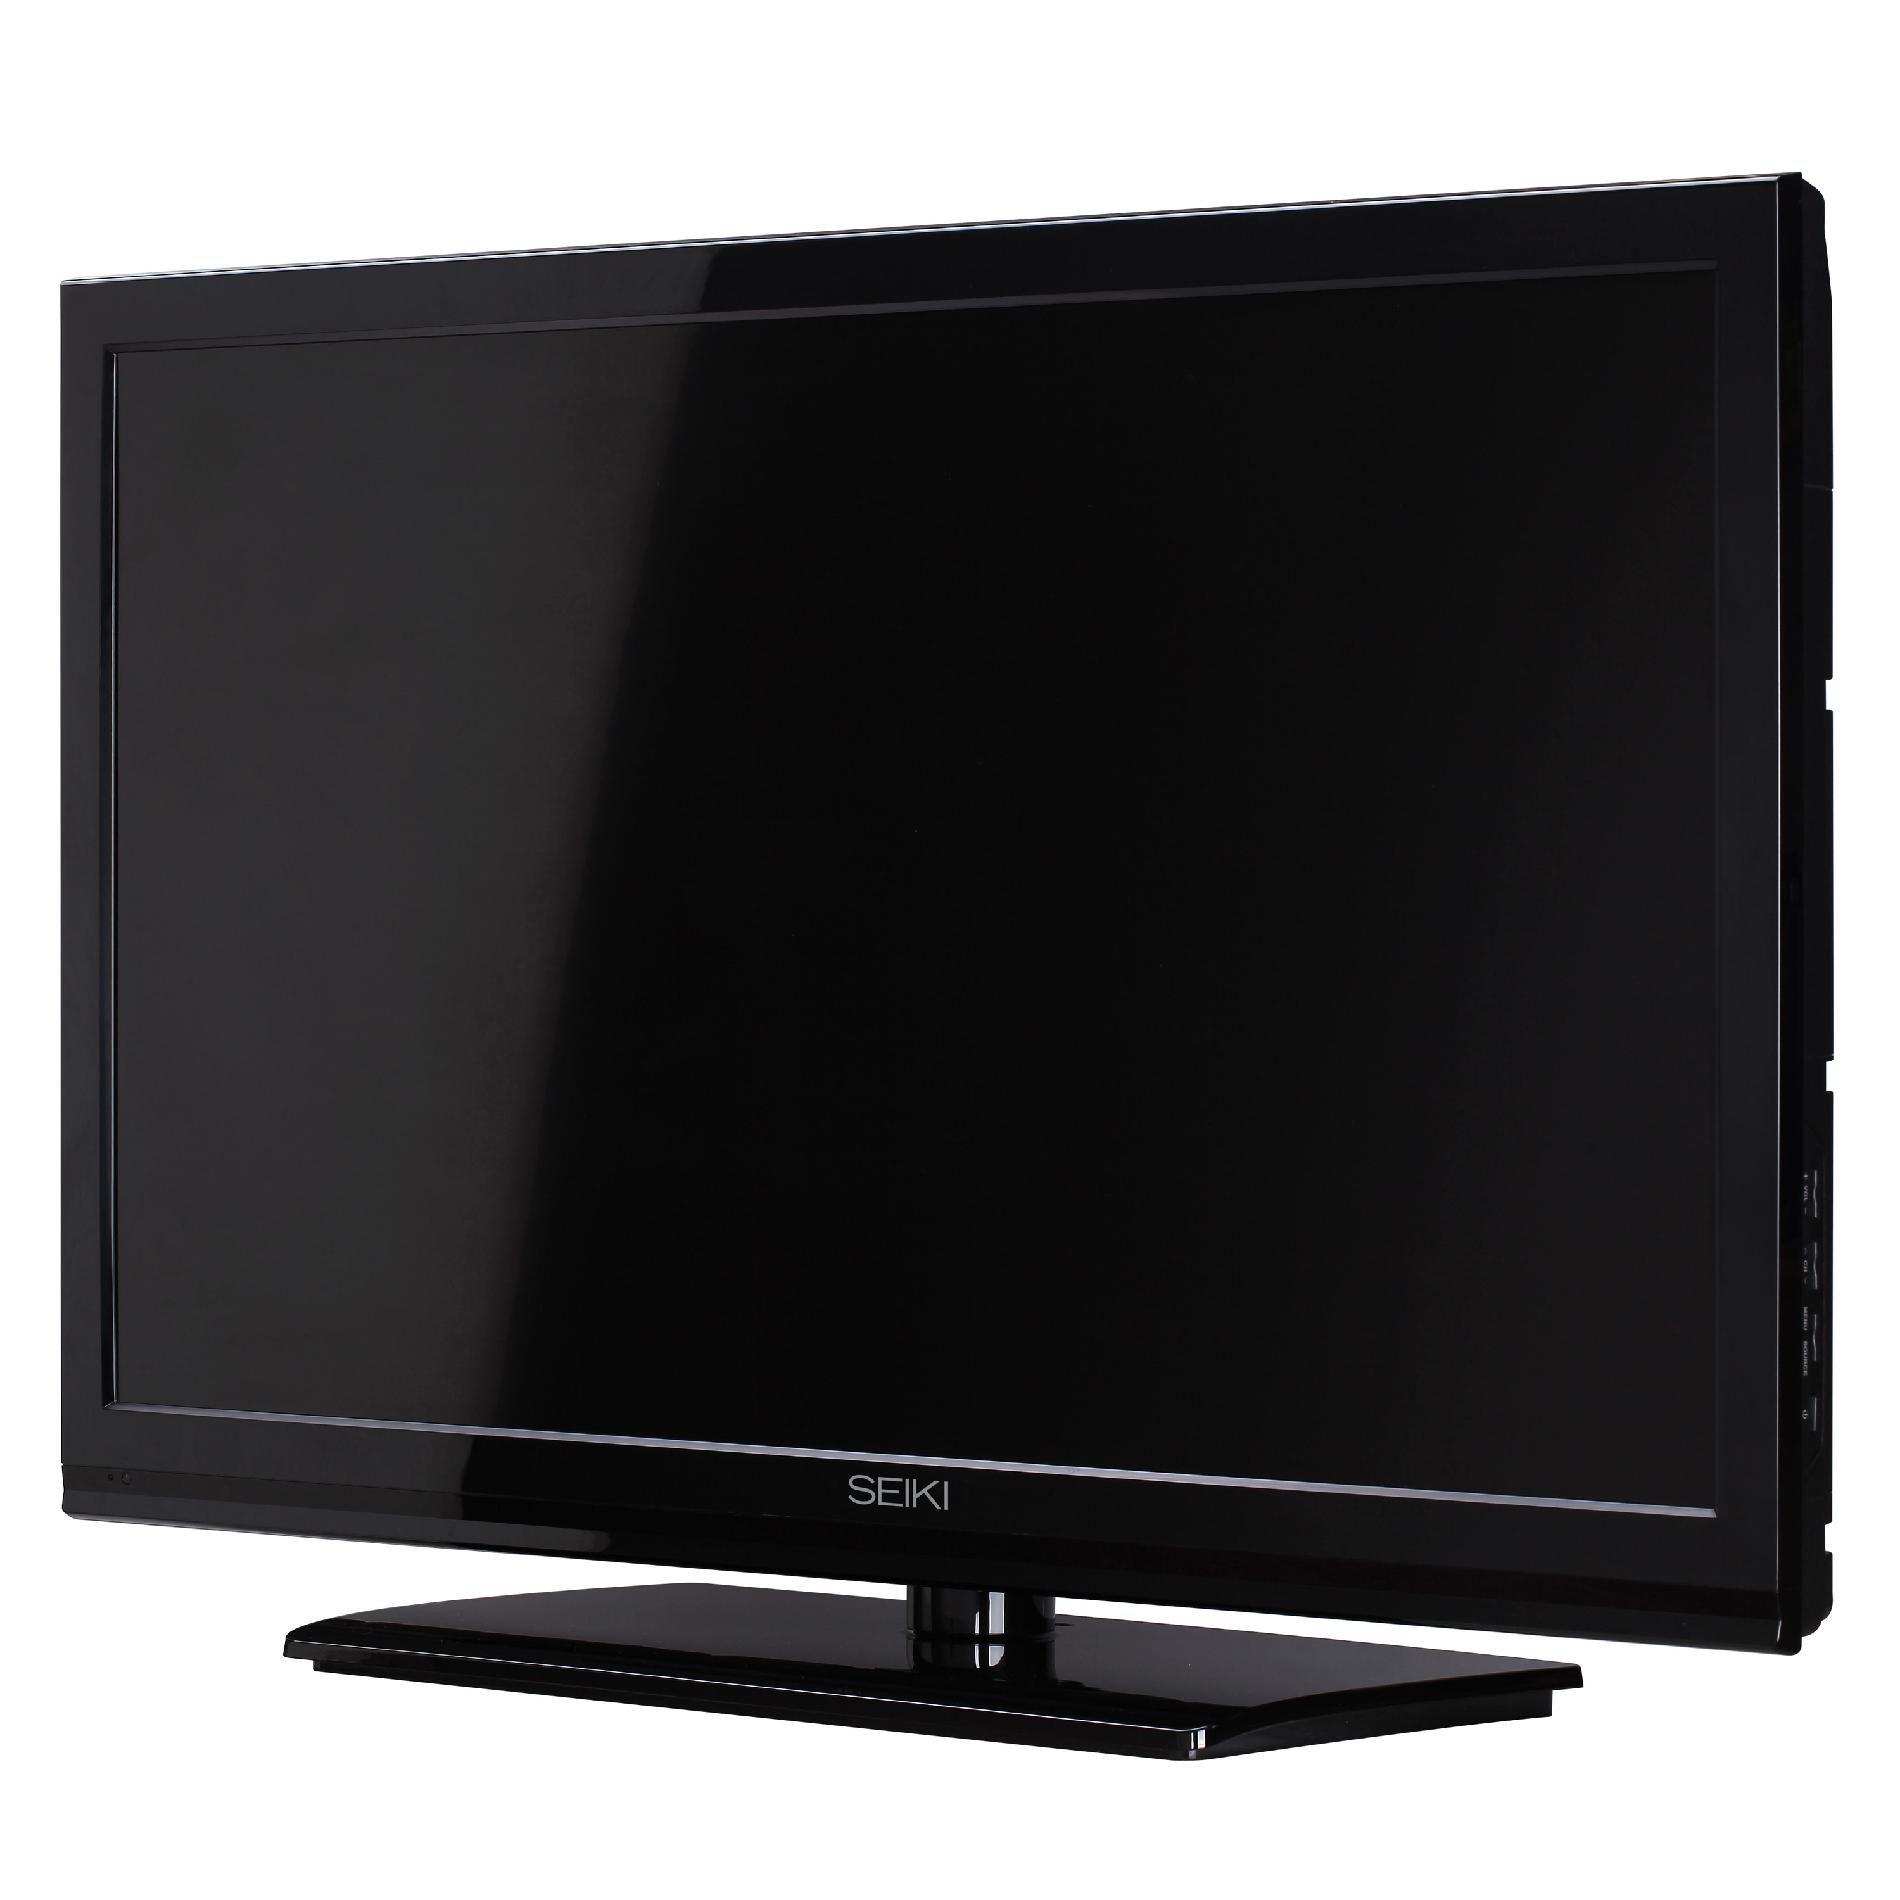 "Seiki 50"" 1080p LCD TV - SC501TS"